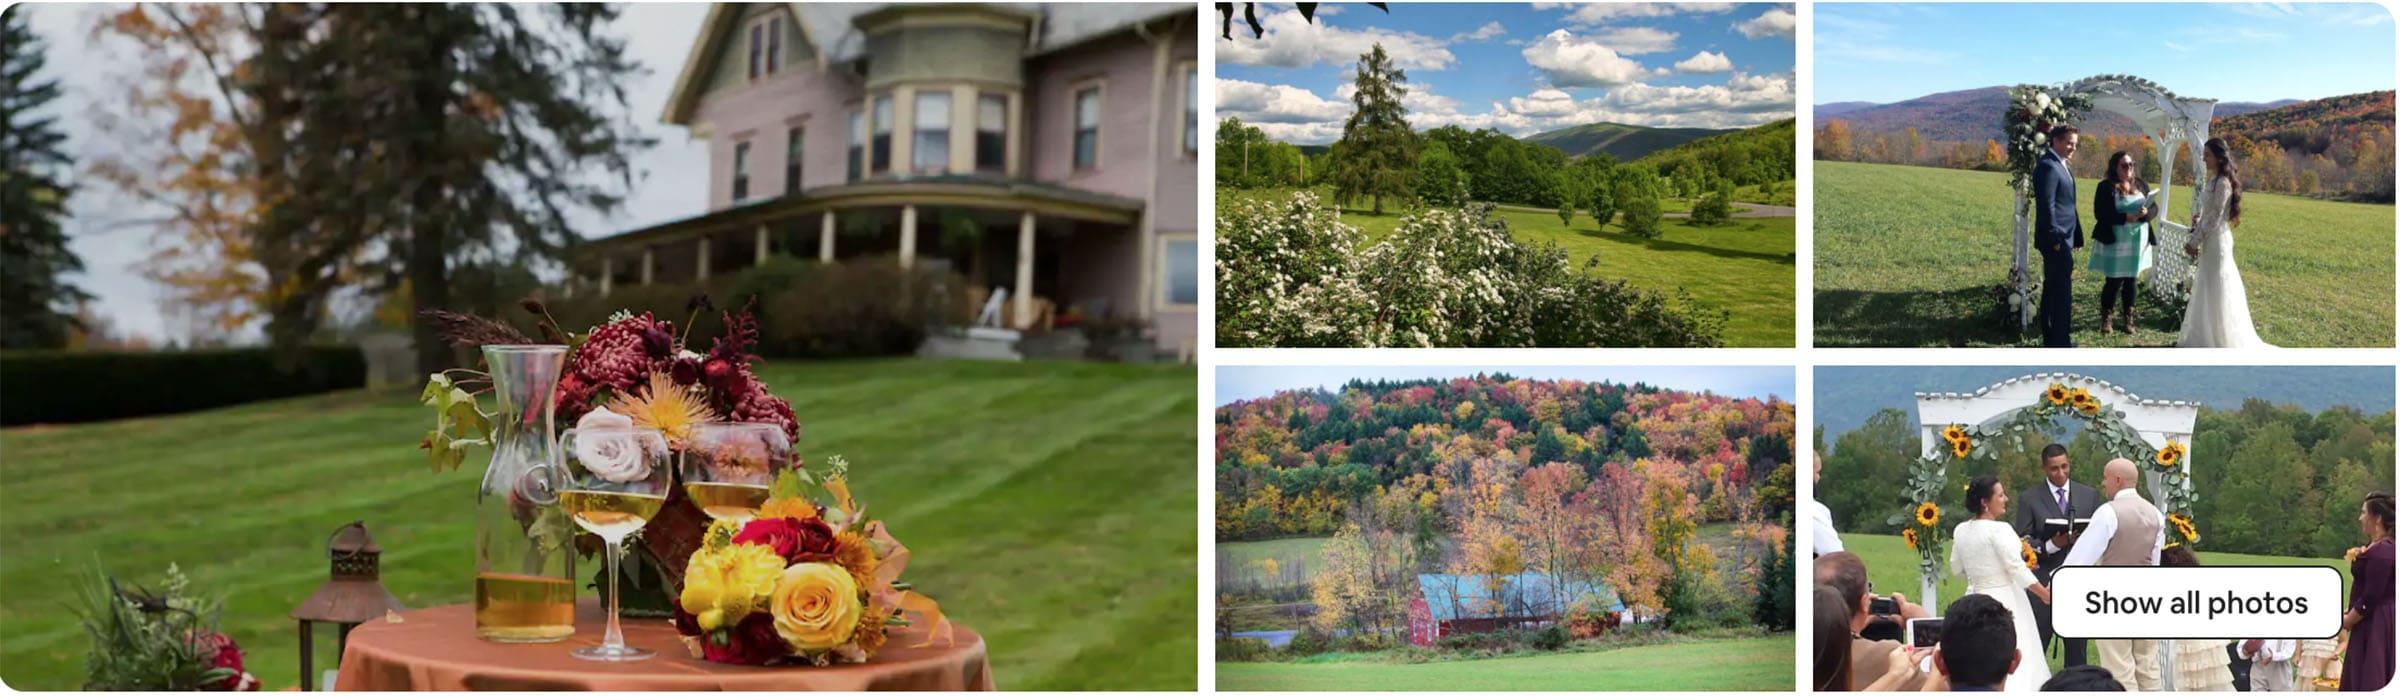 best airbnb wedding venue in Catskills